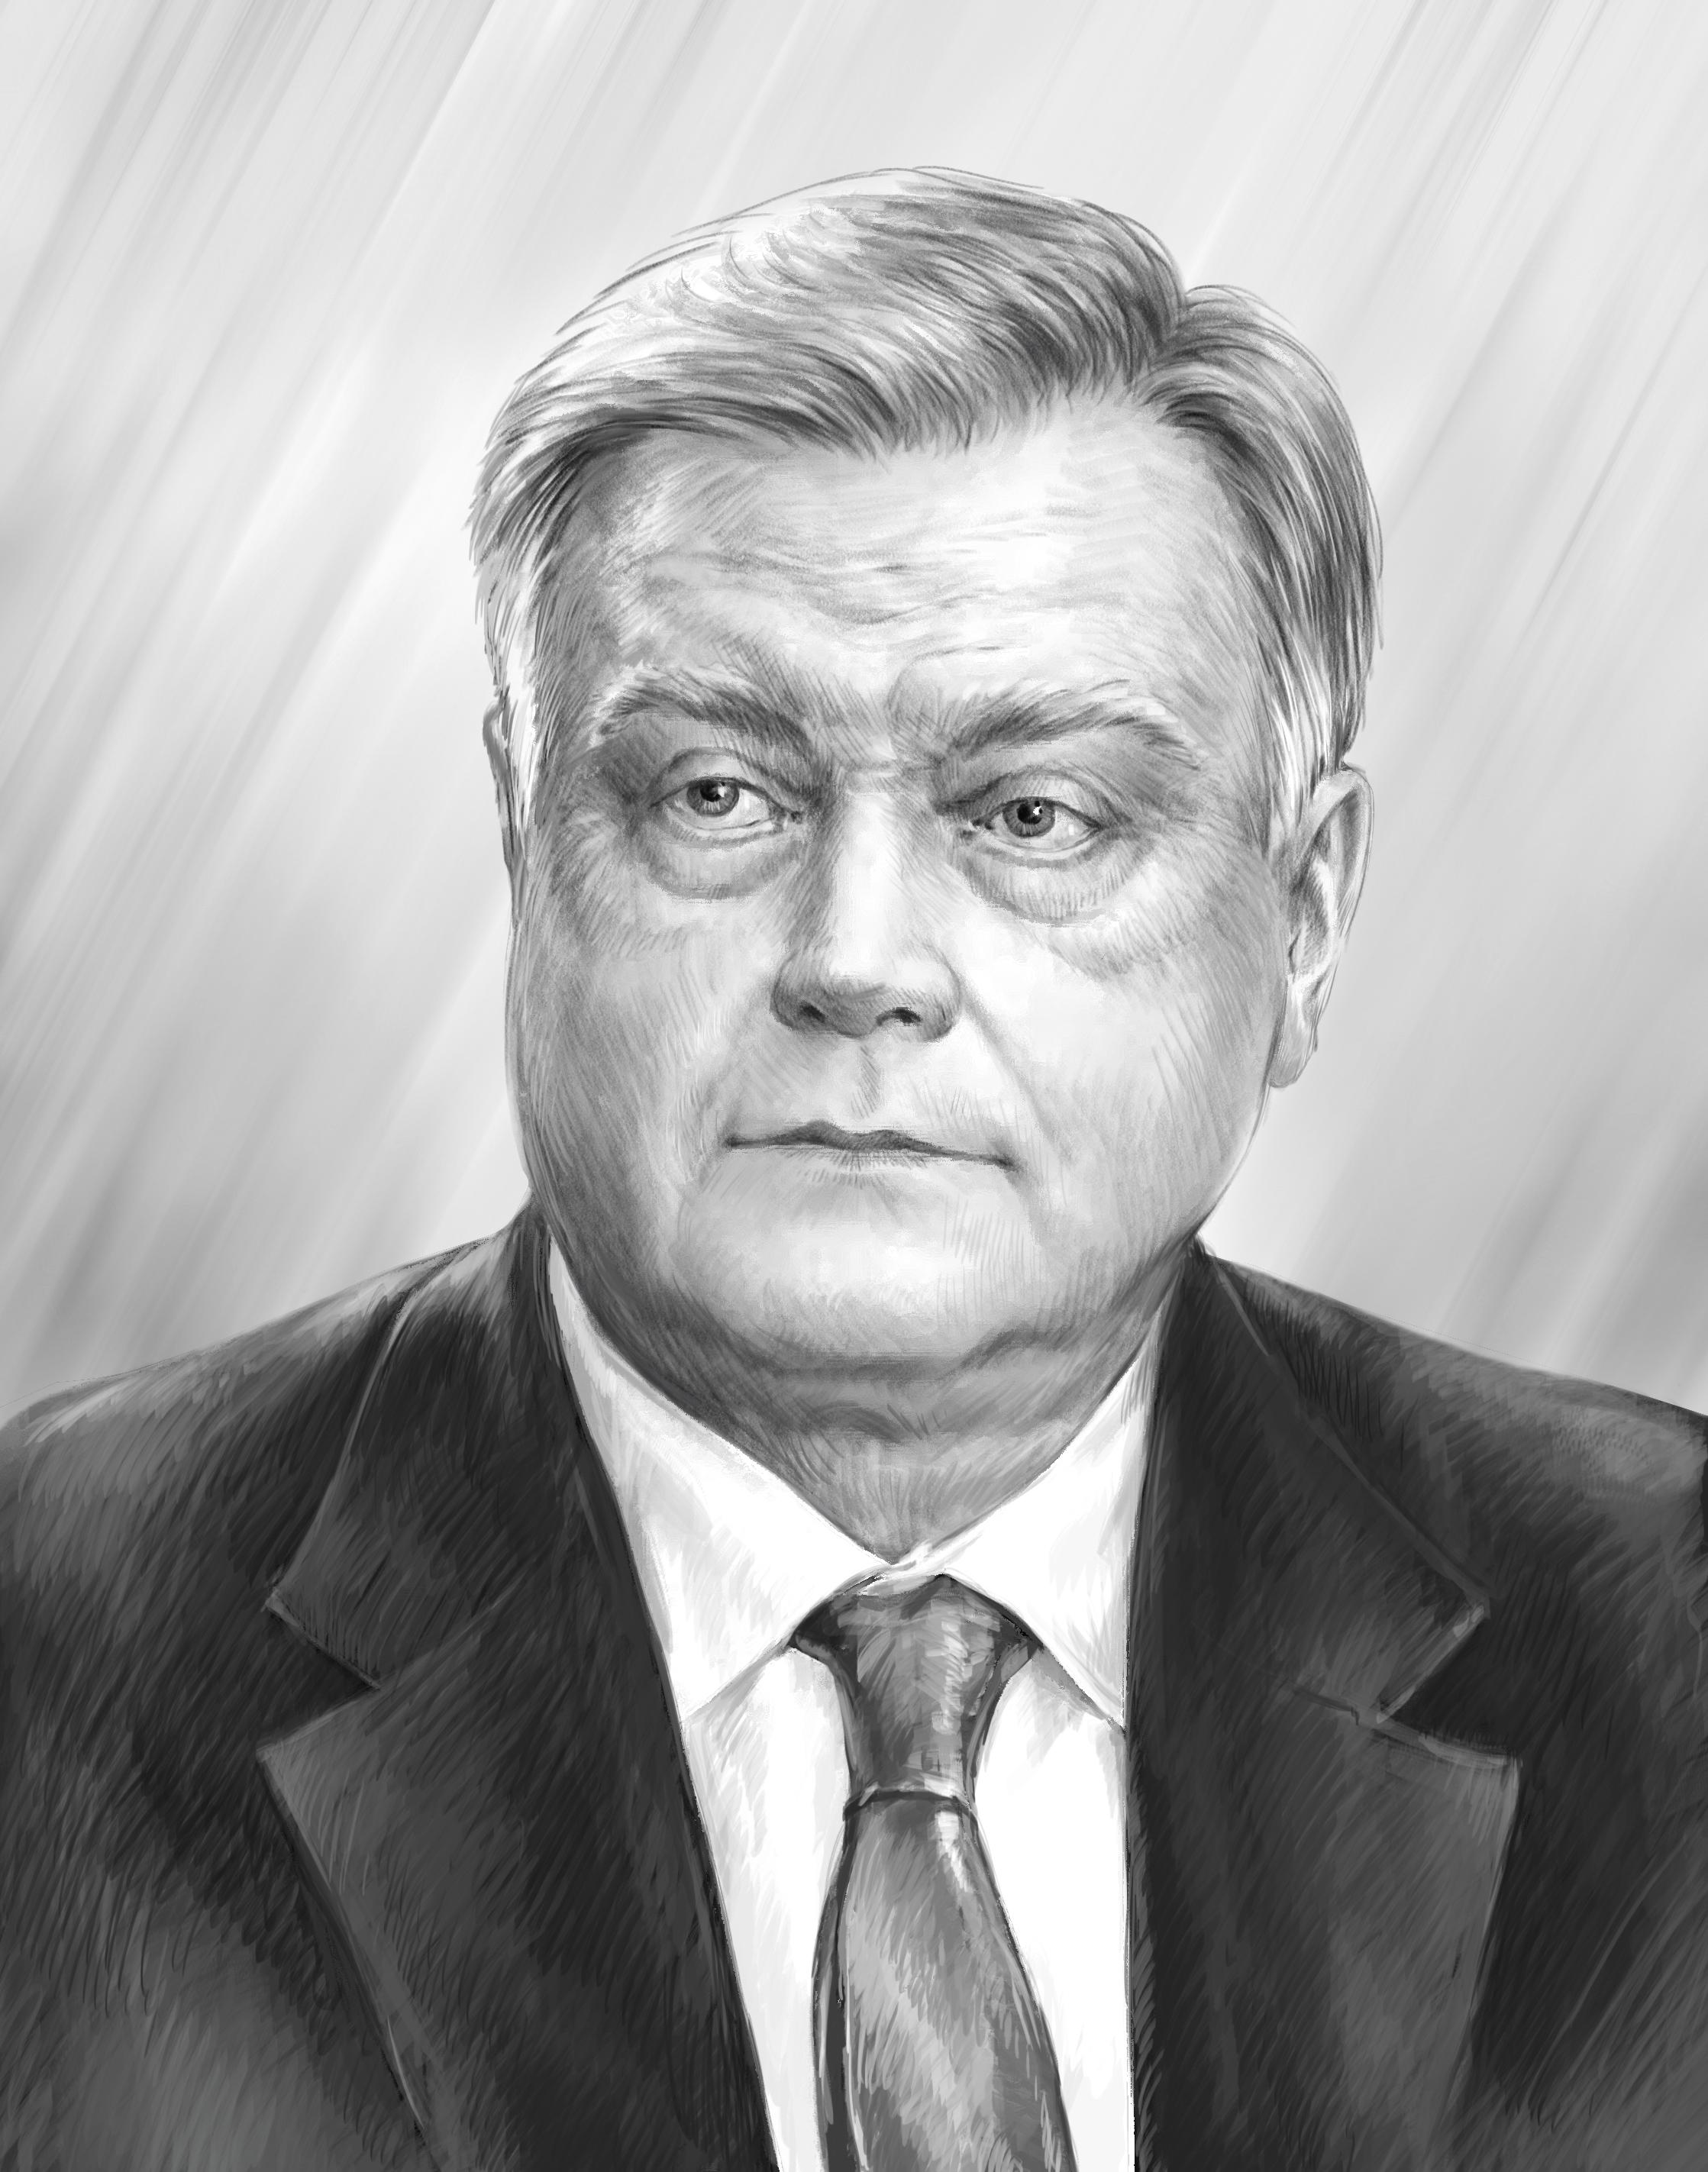 Президент на ОАО РЖД Владимир Якунин